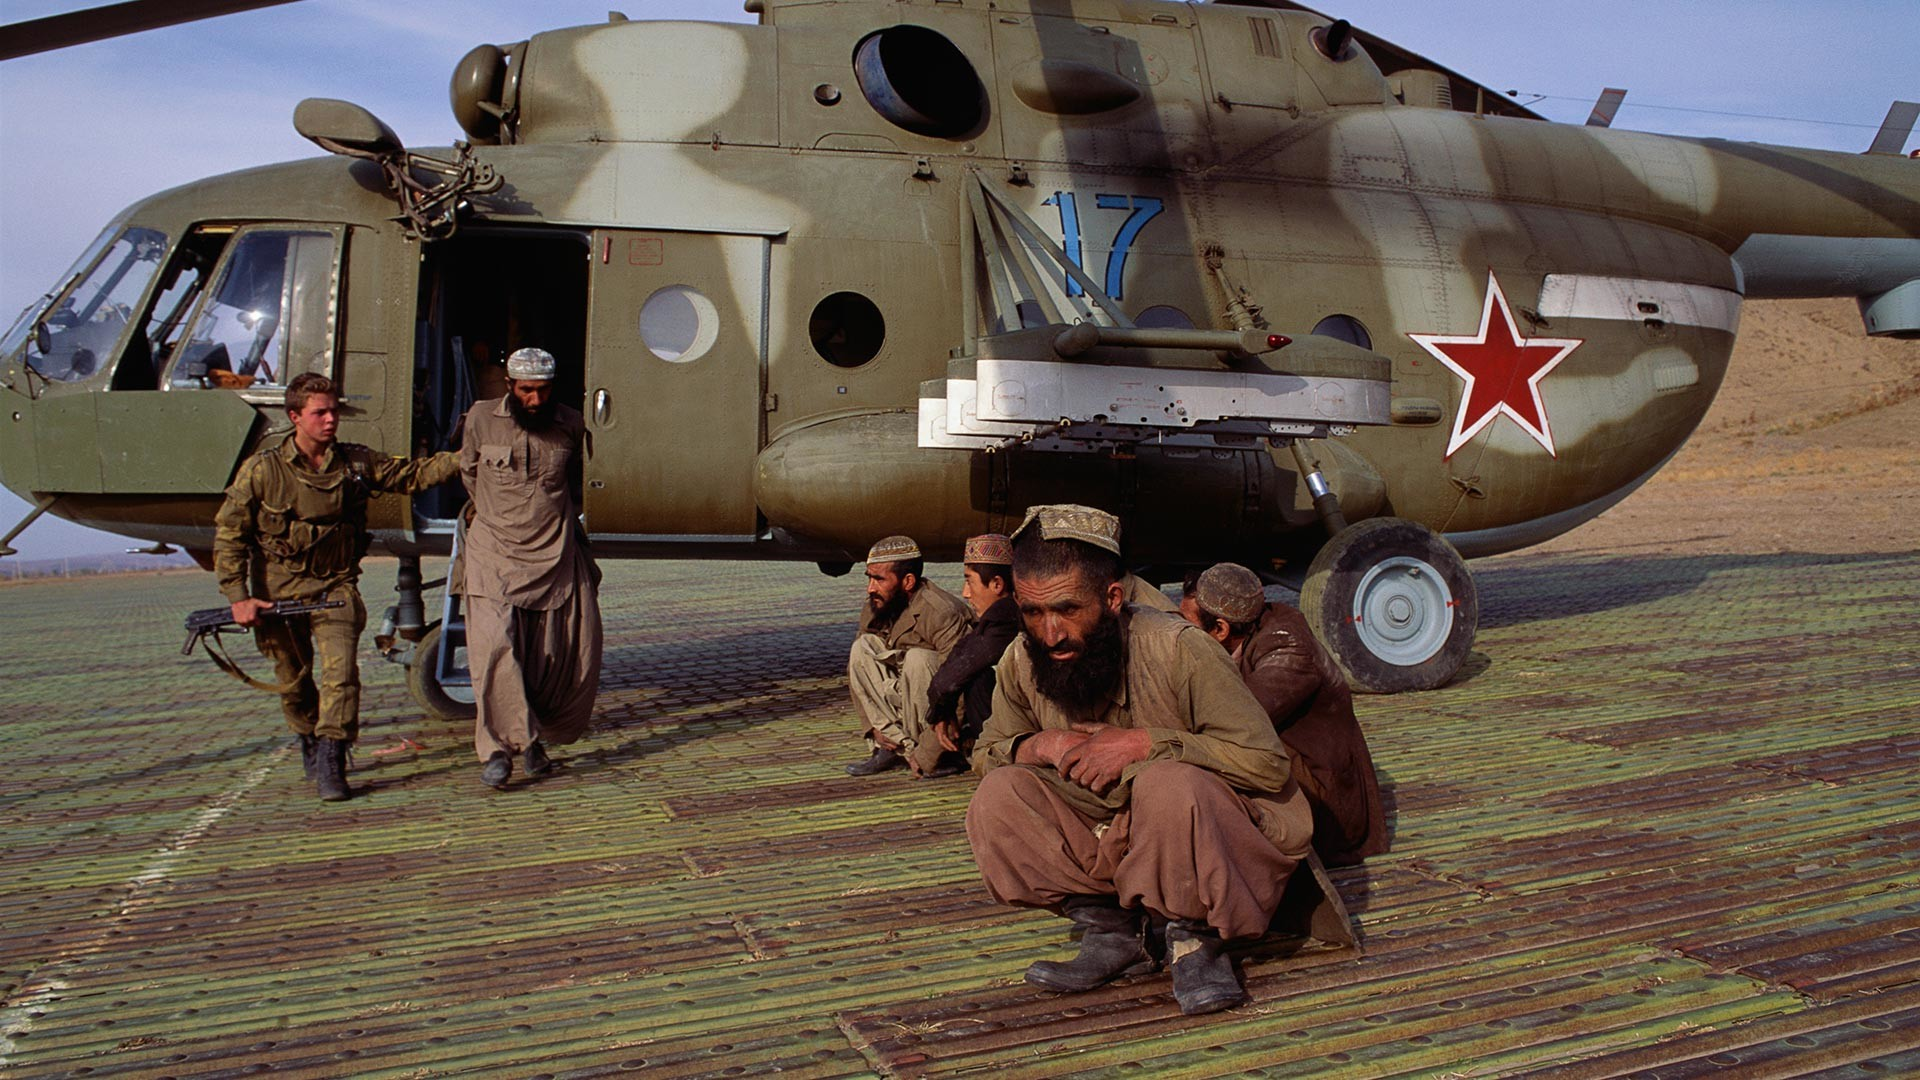 Guardias soviéticos arrestan a hombres afganos